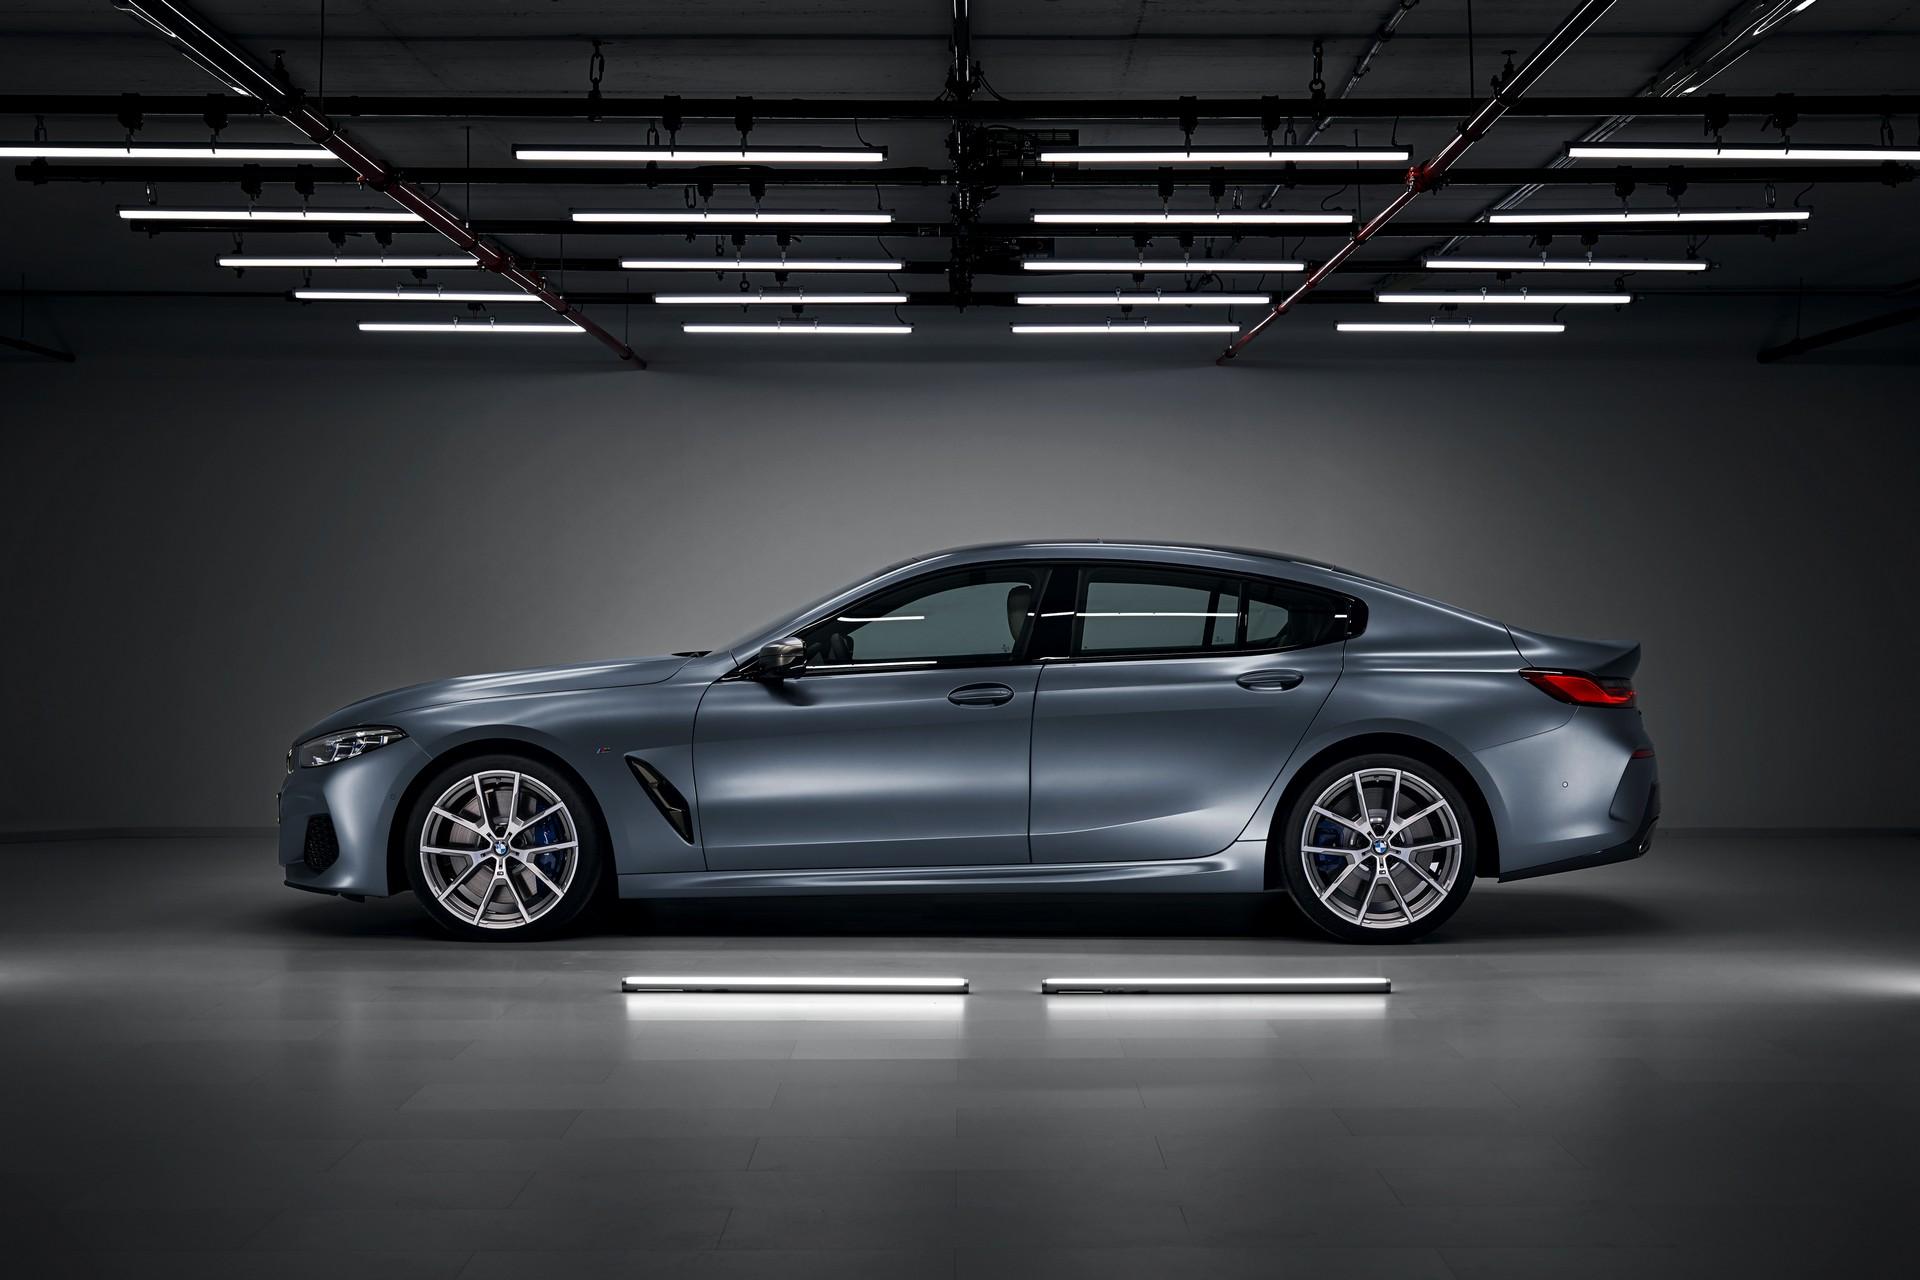 2020-bmw-8-series-gran-coupe-4.jpg